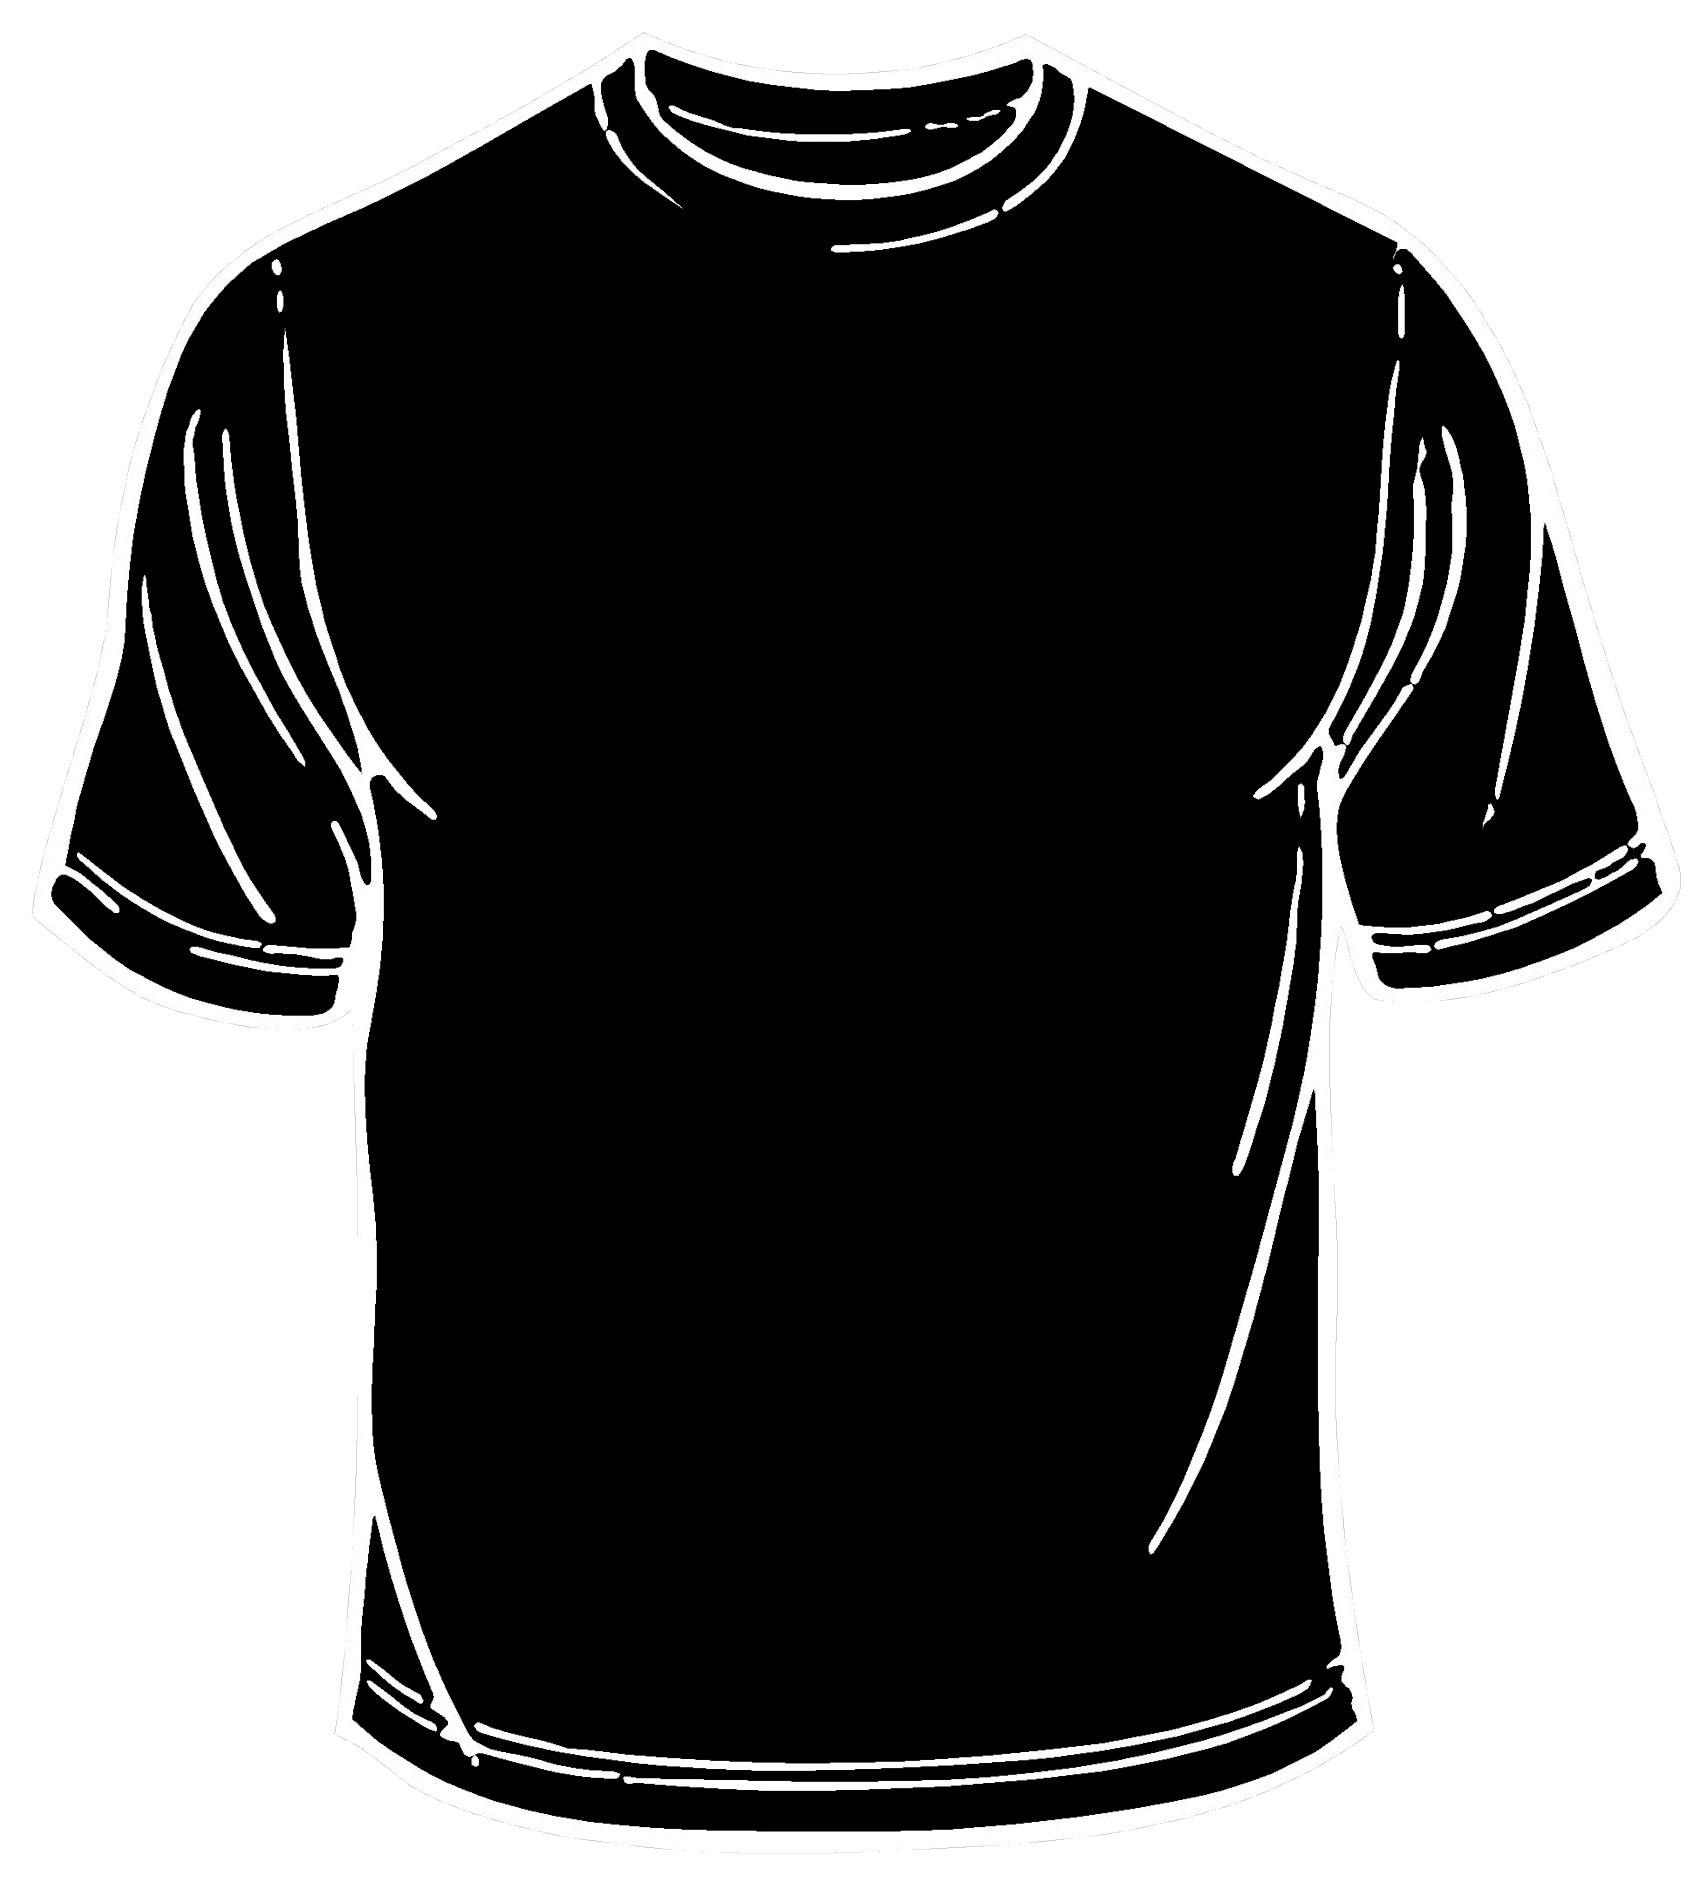 ladies black t shirt template - photo #22